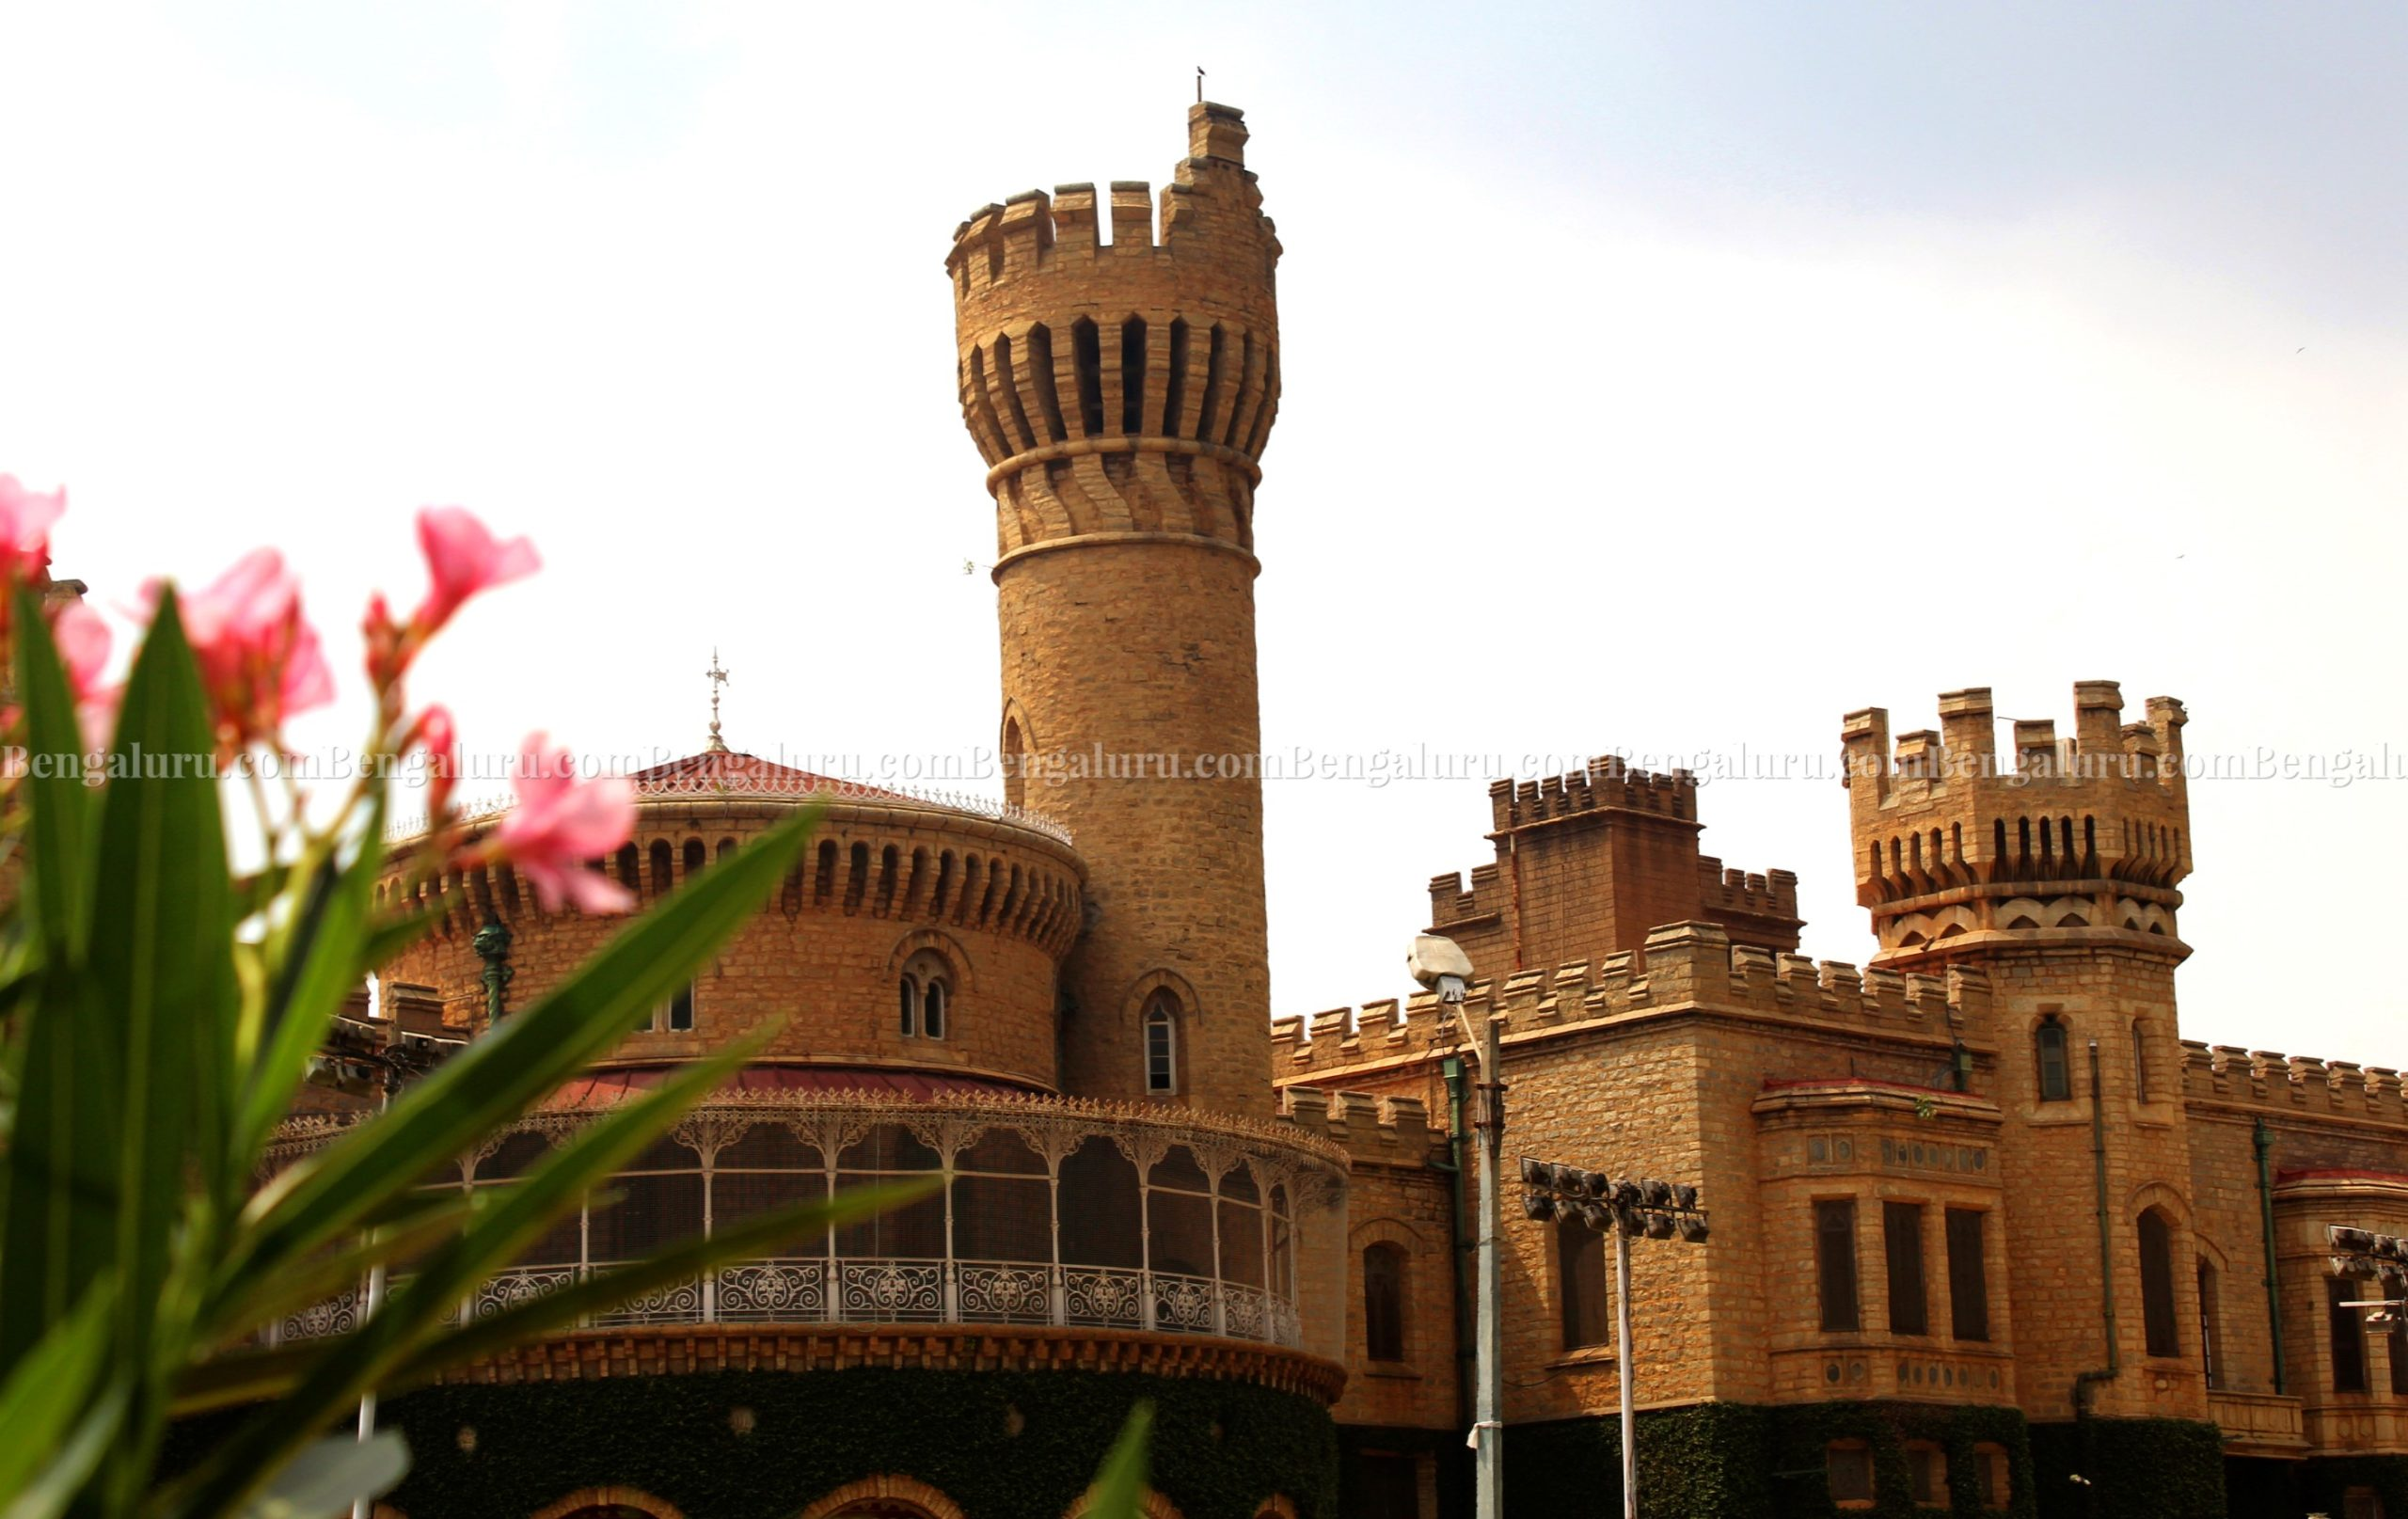 A View of the Bengaluru Palace